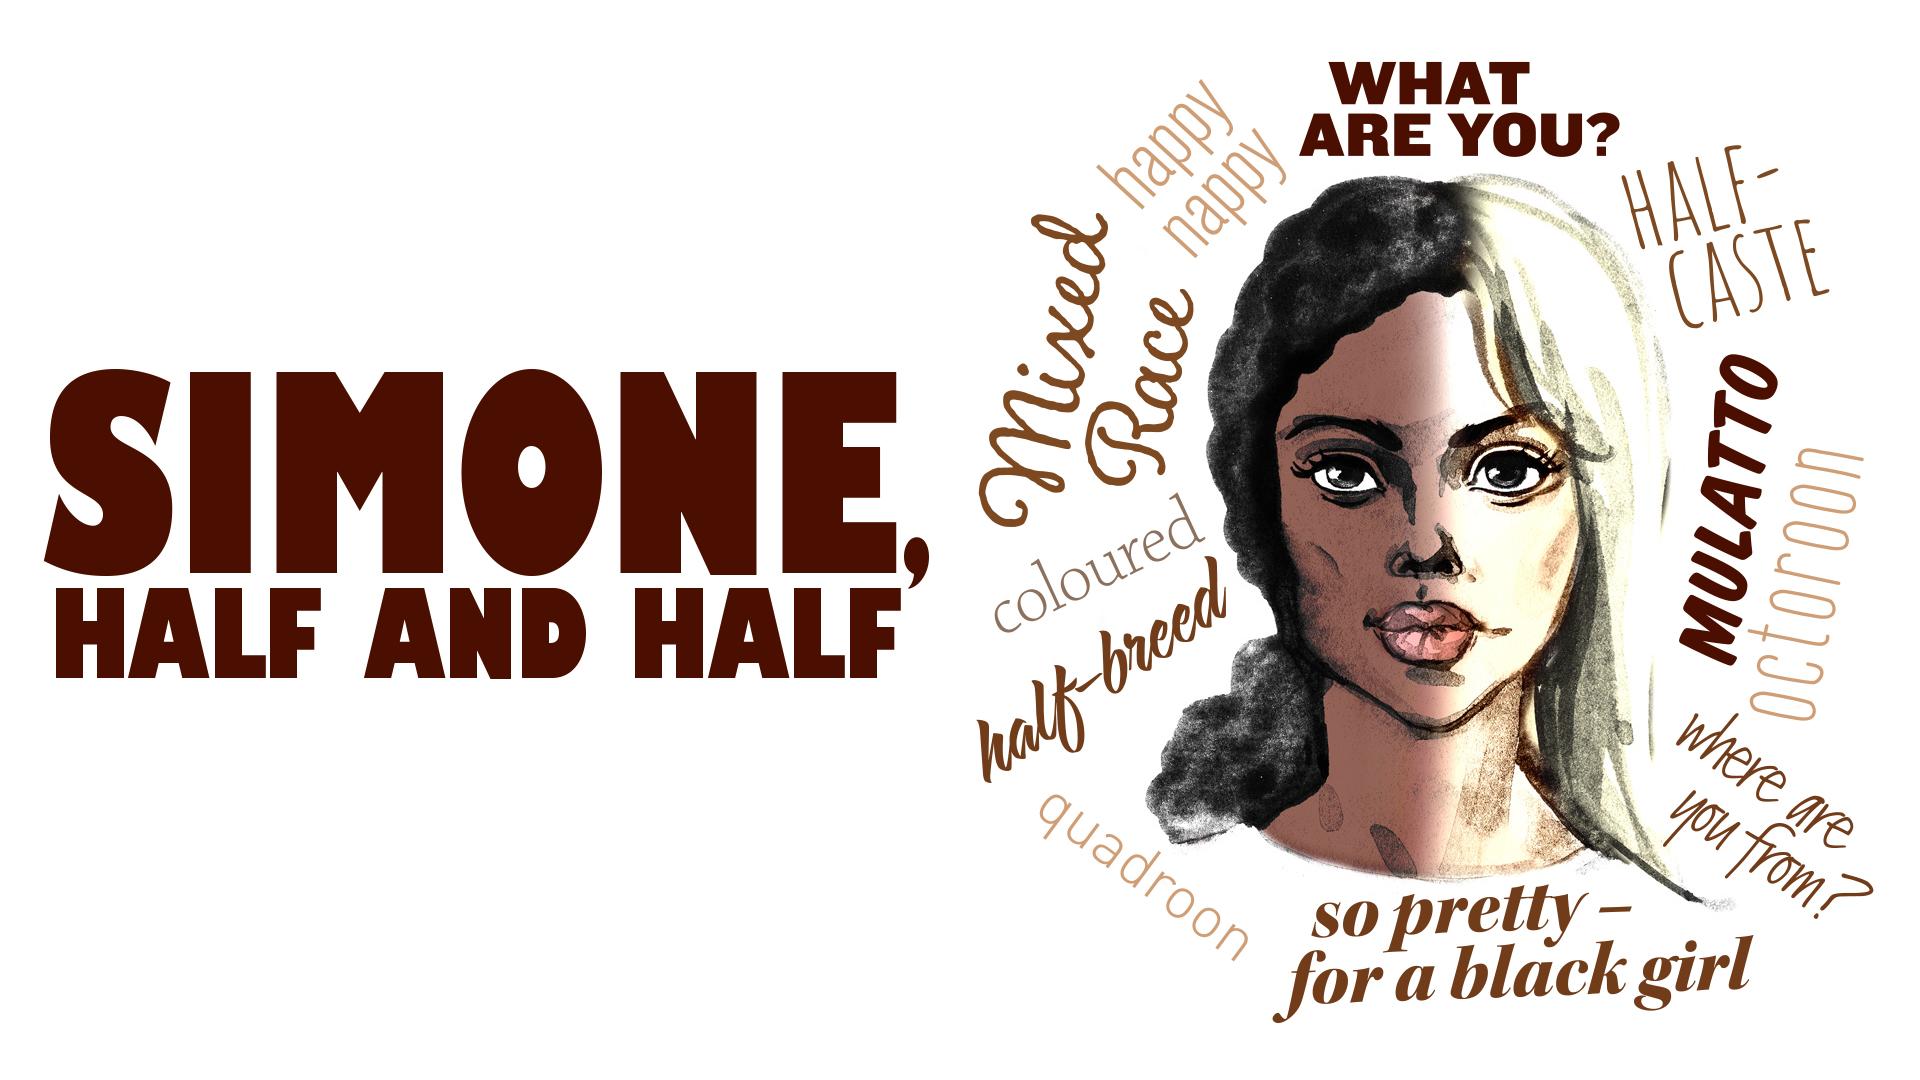 Simone half and half - feb 22 @ BCRC